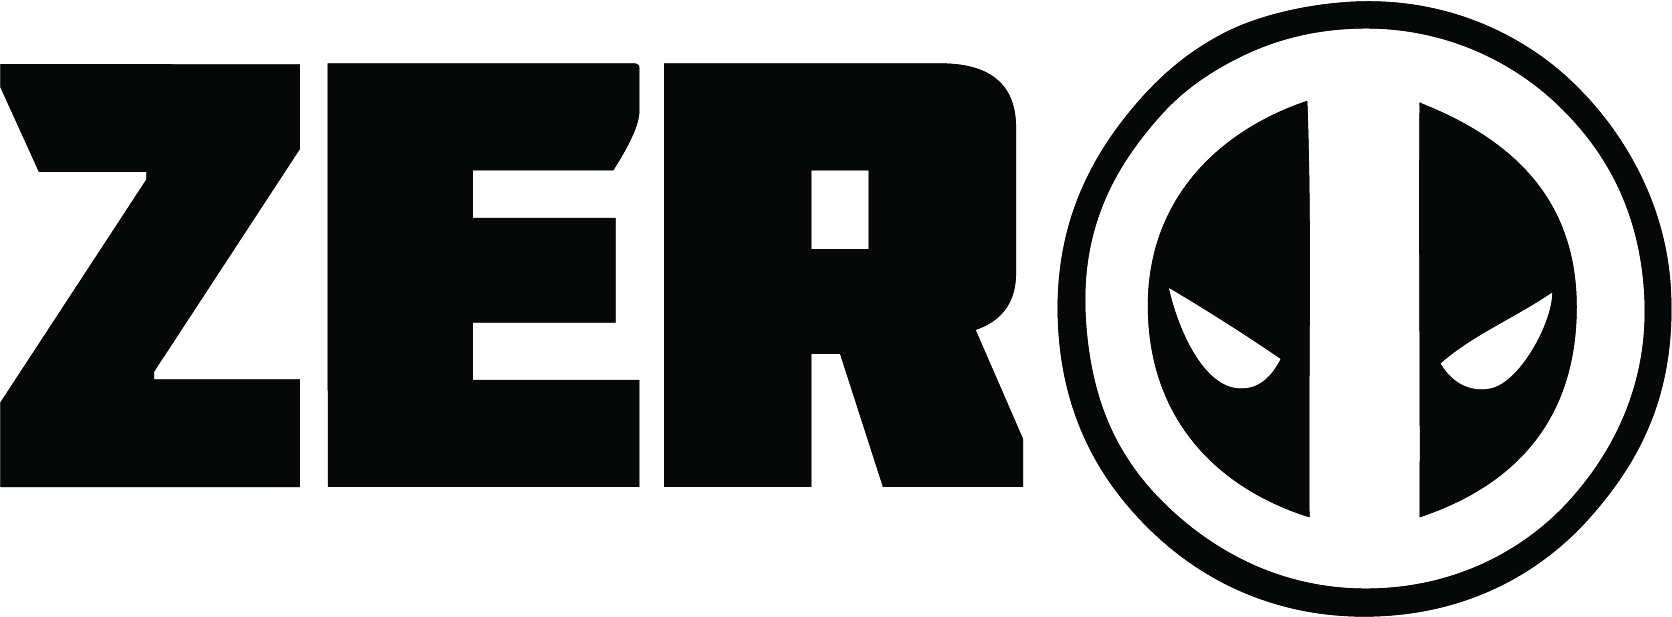 ZCOp logga JPG kopiera